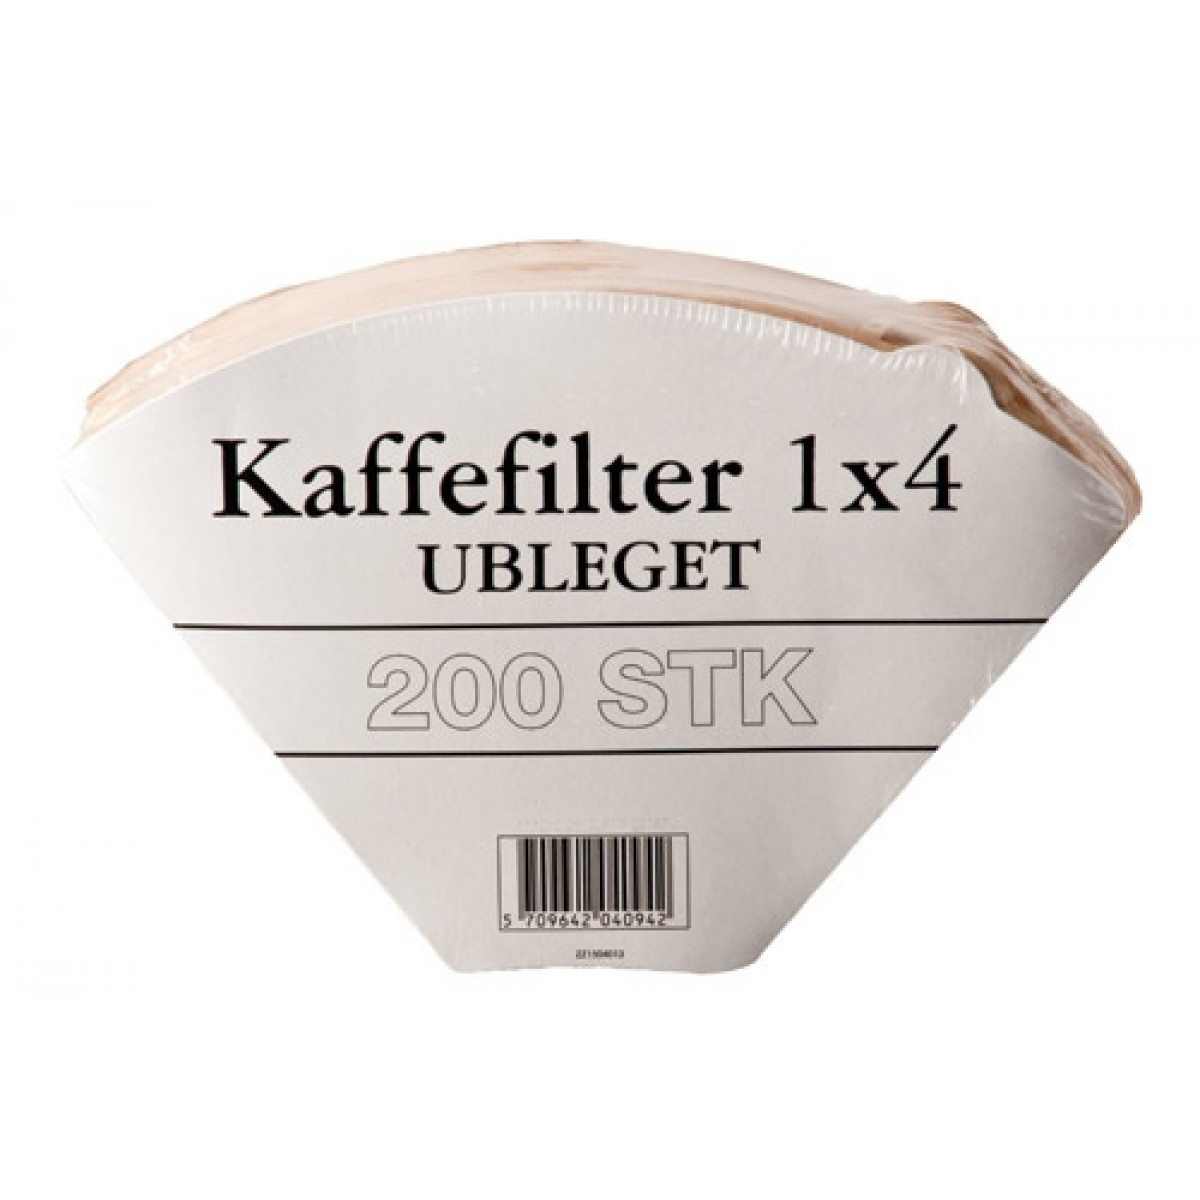 Filterpose 1 x 4 ubleget-31